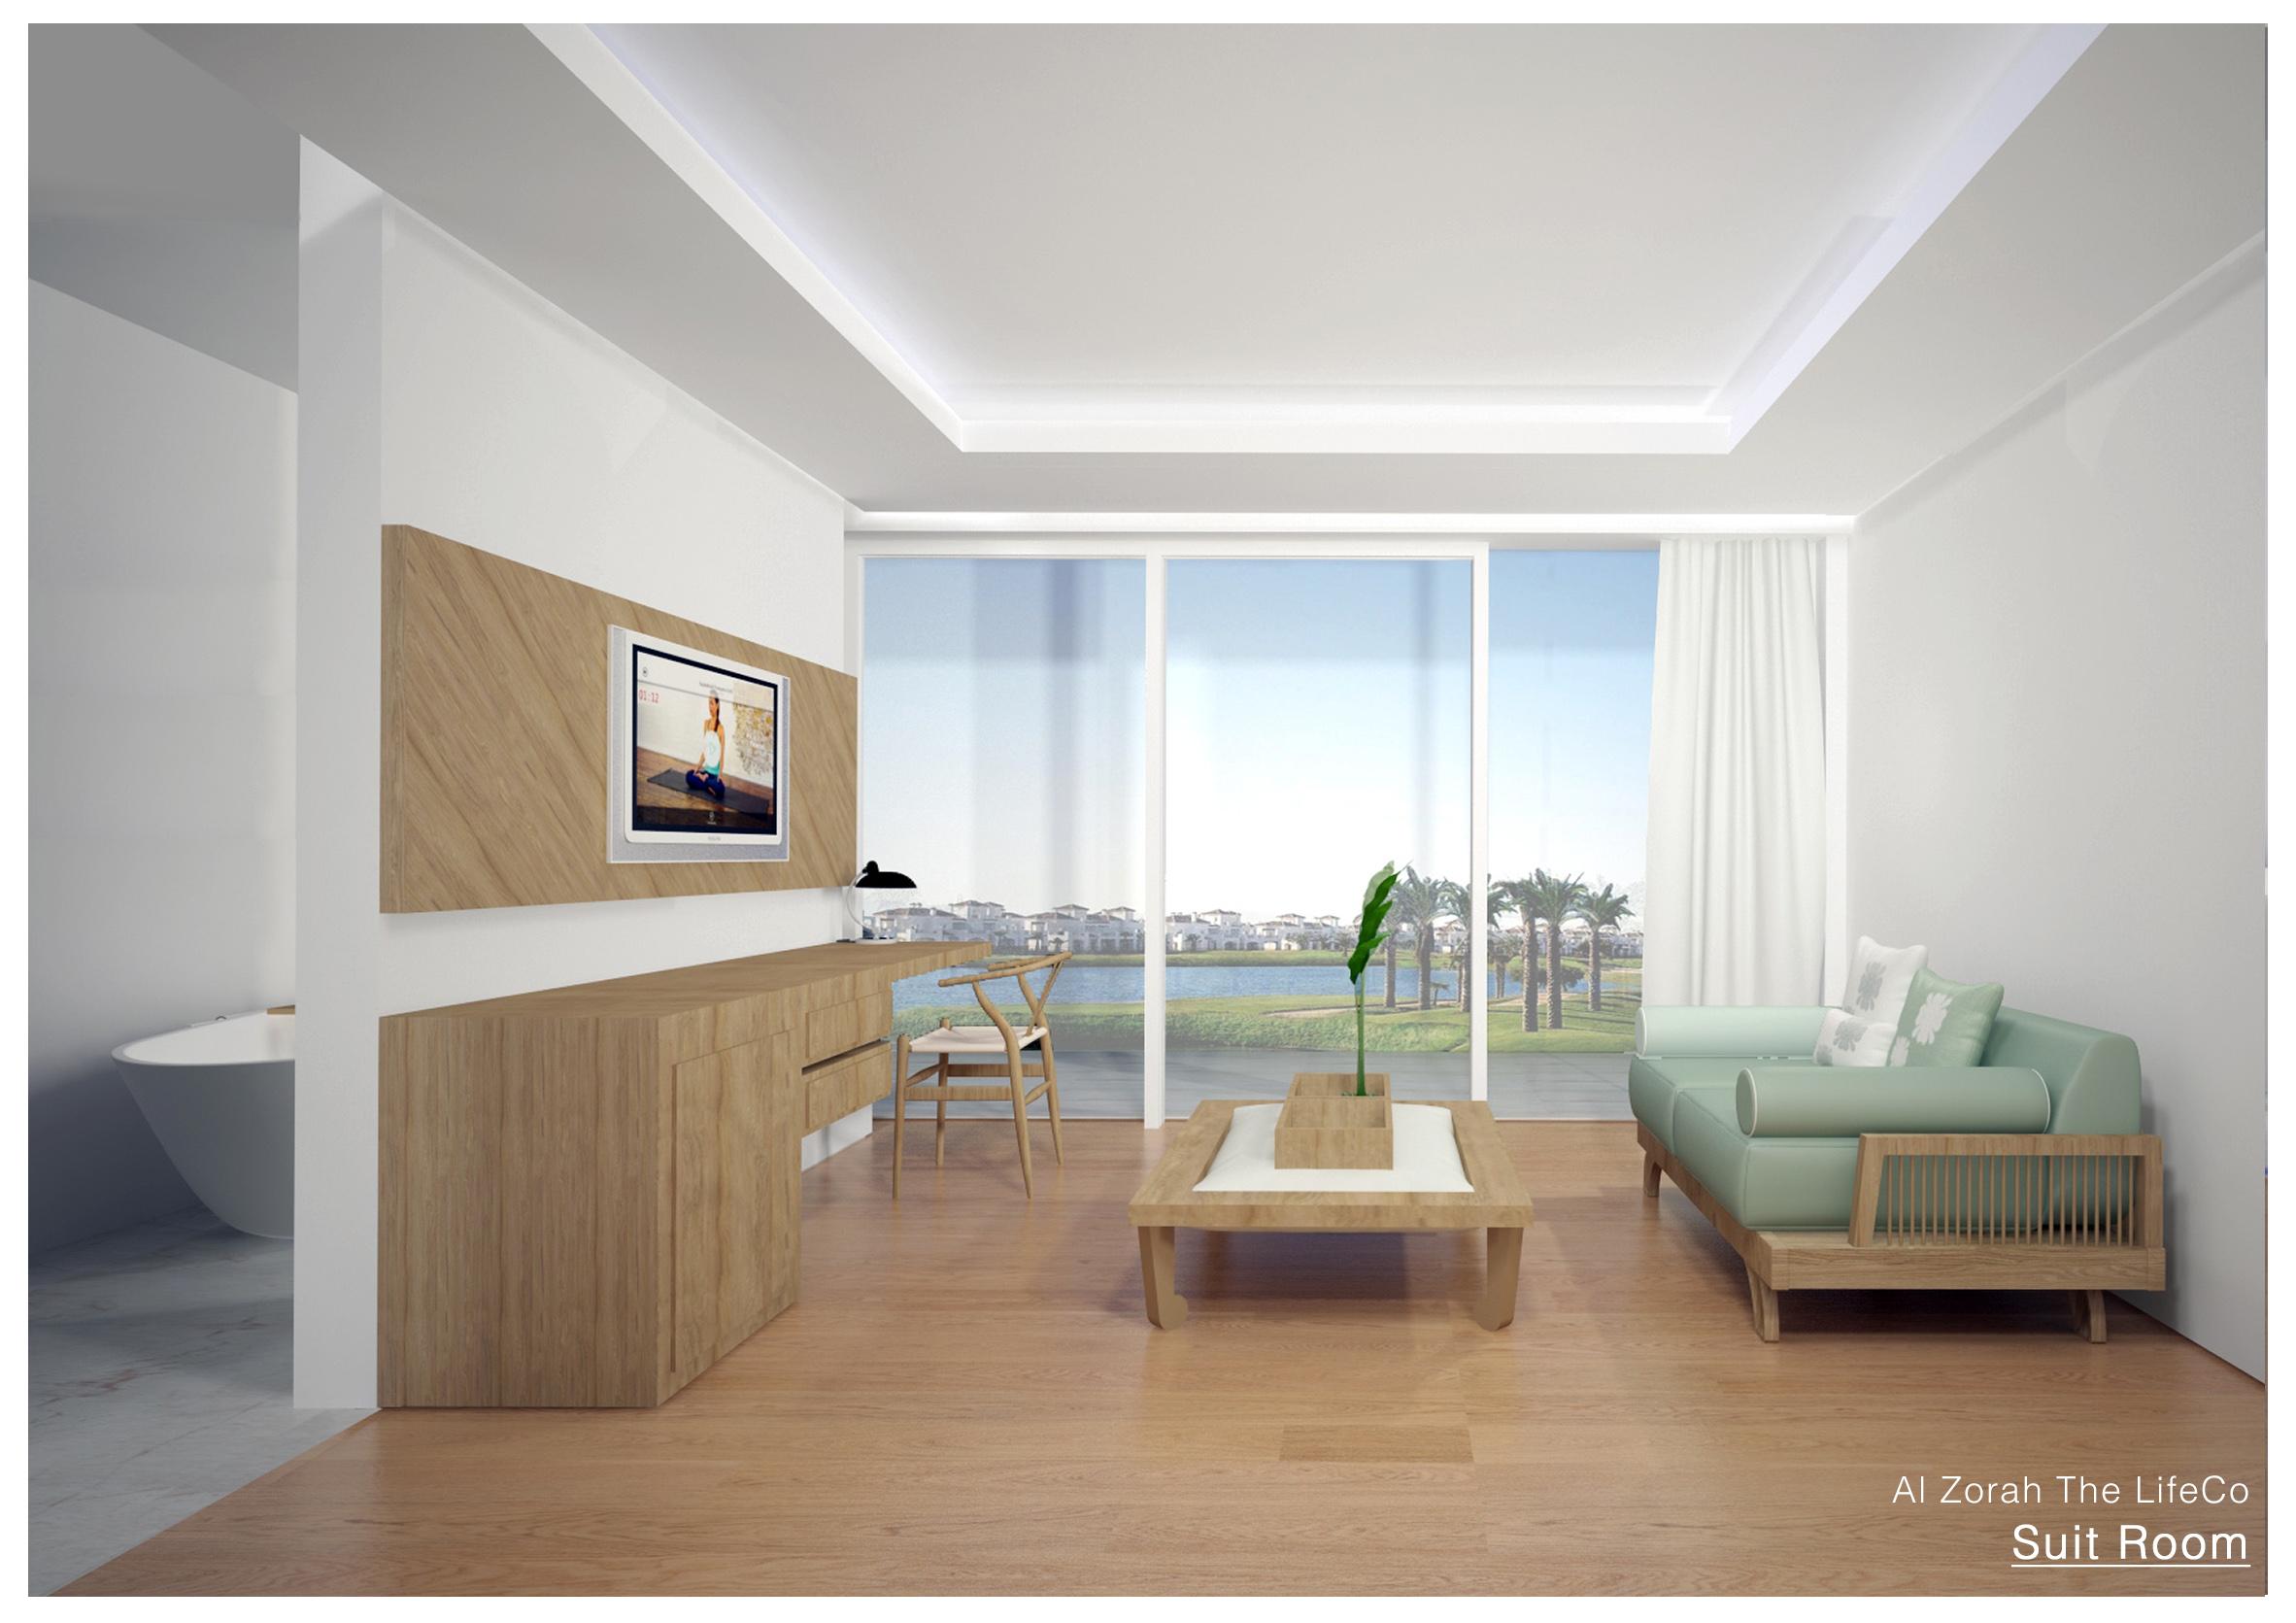 05_suit-room-2